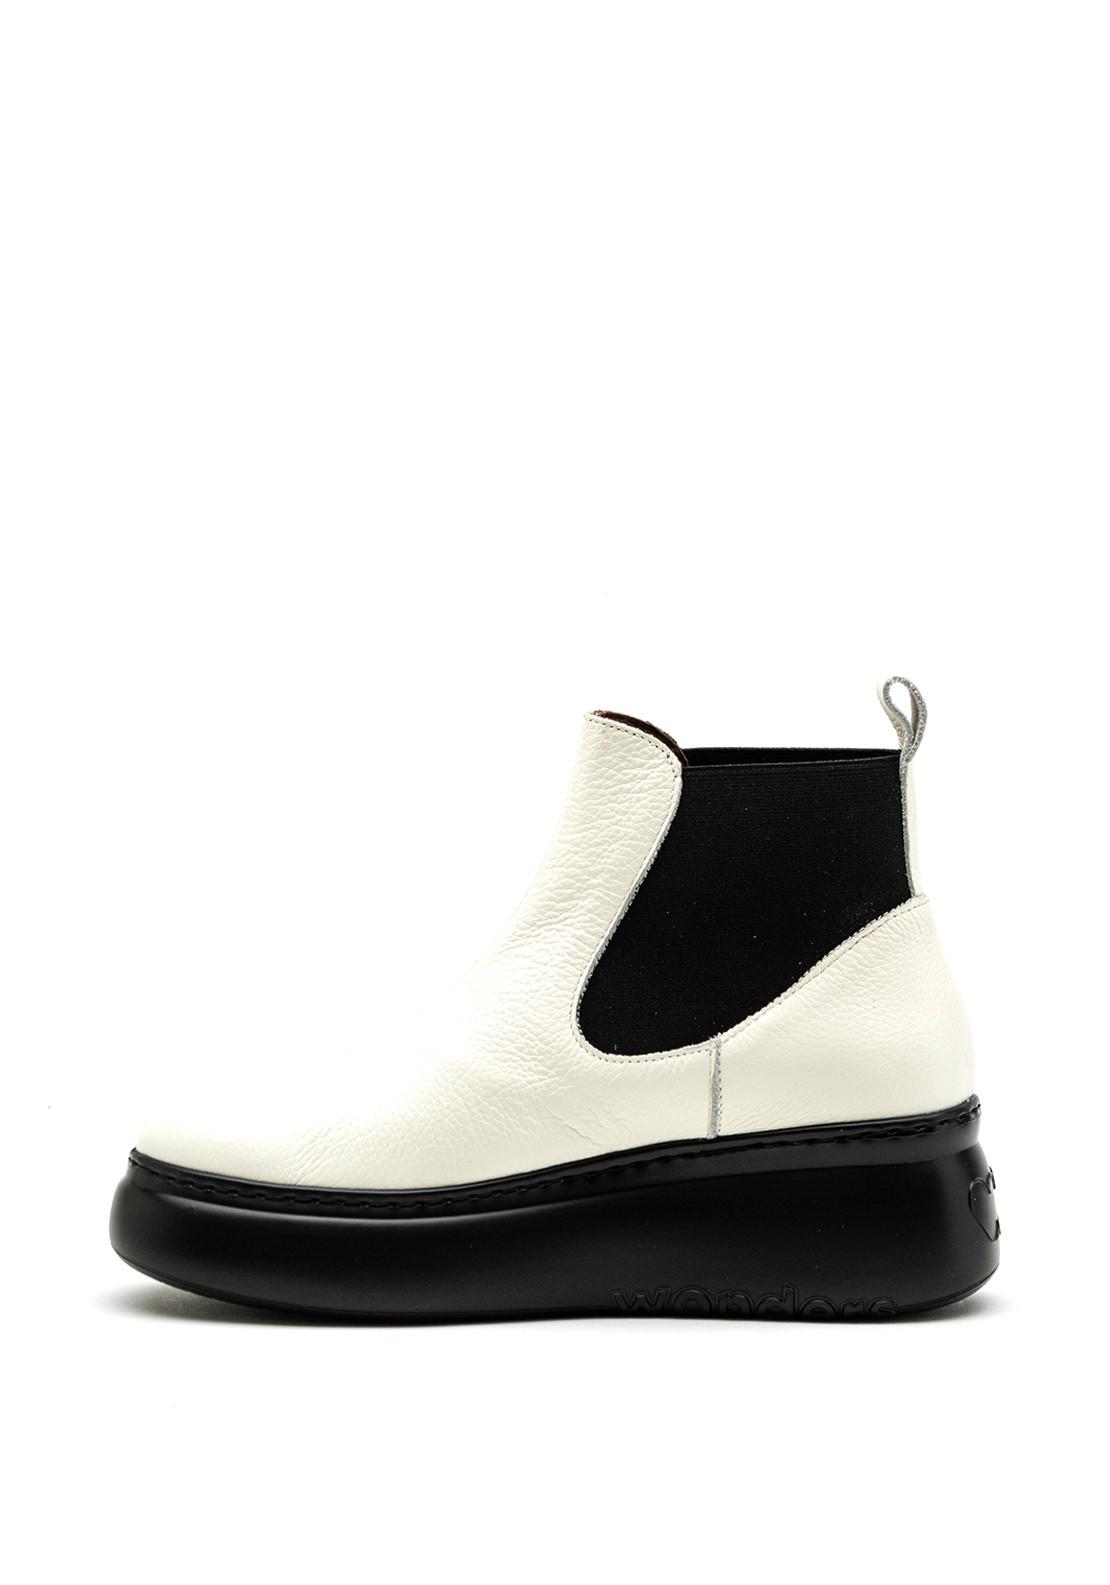 Wonders A-2604 milk white wedge boot